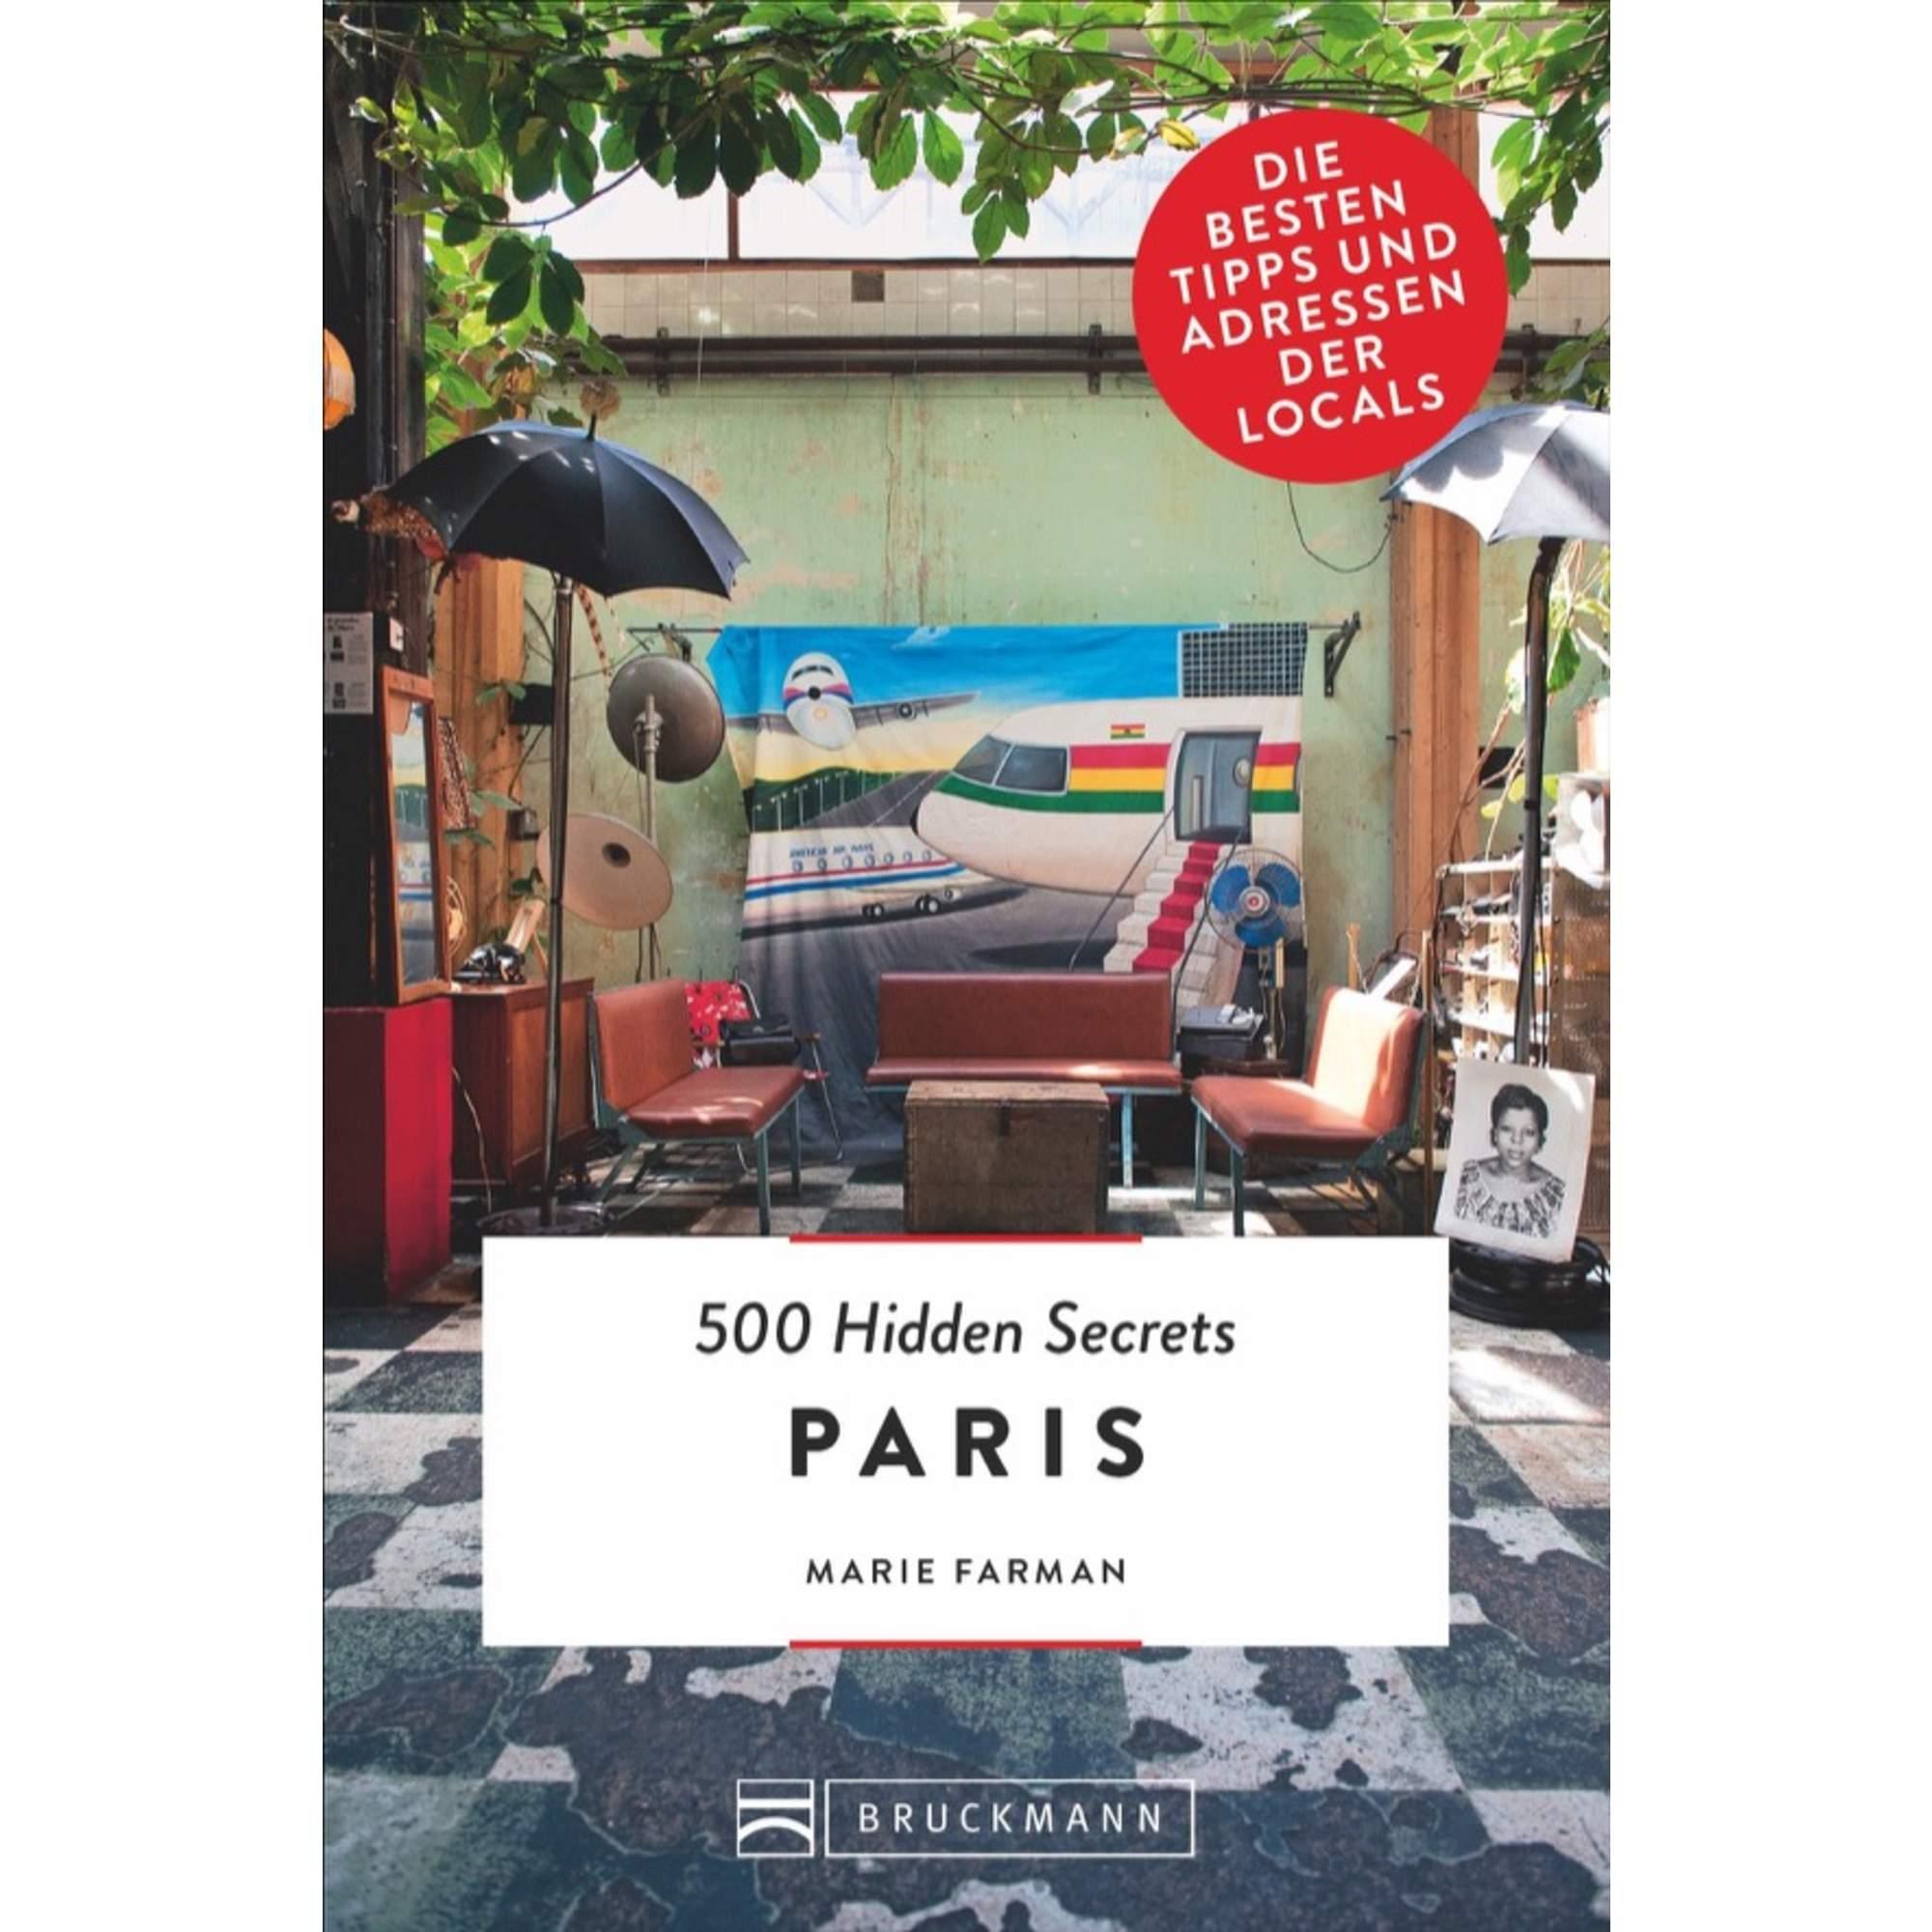 500 HIDDEN SECRETS PARIS, 16,99 Euro